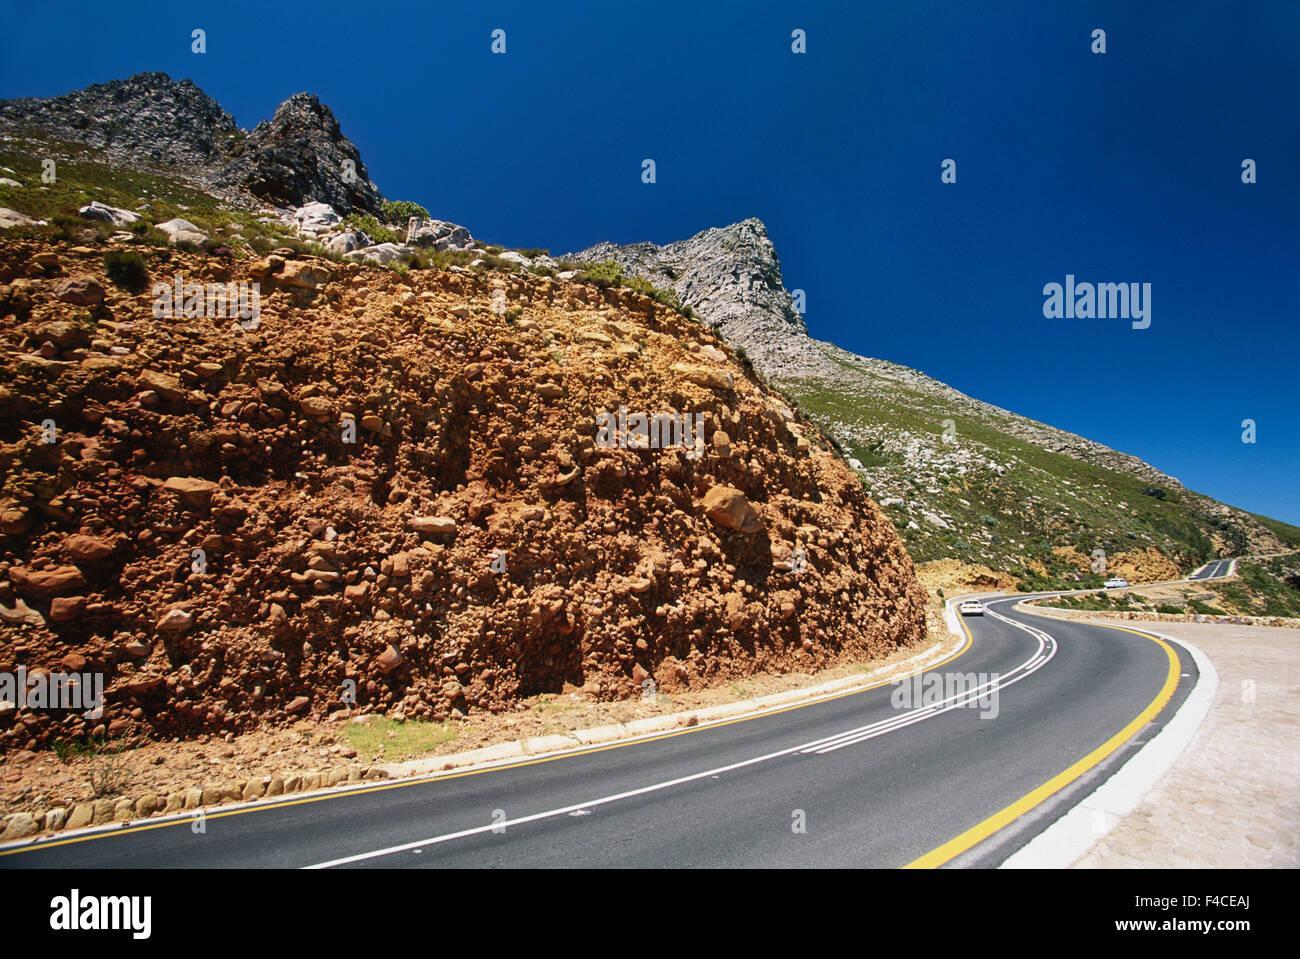 South Africa, False Bay, Coastal road 44 highway along Eastern side of False Bay by Rooi-Els Bay. (Large format - Stock Image